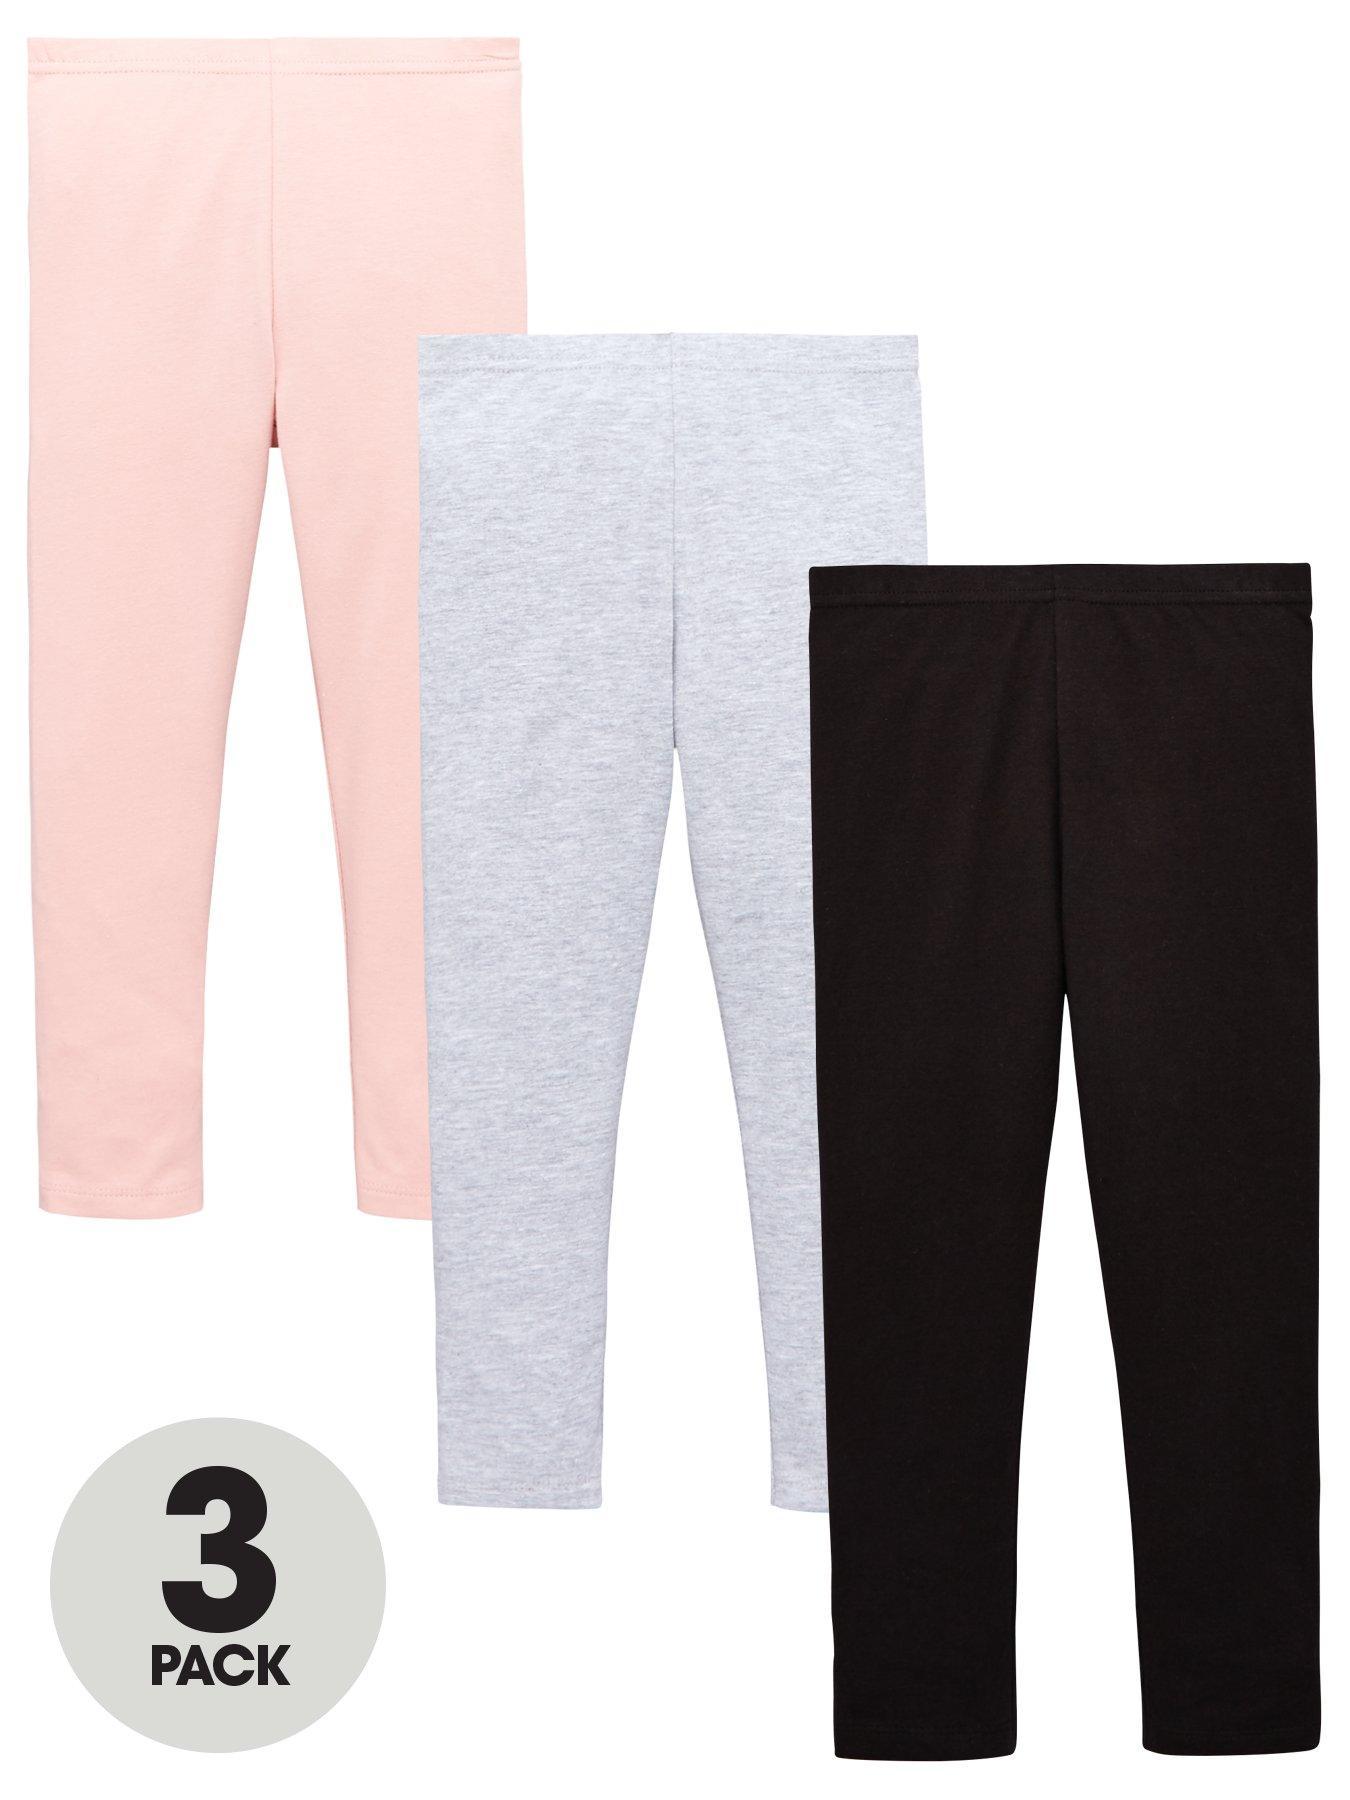 Childs Girl Stretchy 3//4 Cotton Legging Kids Plain Soft Sports Wear Novelty Pant